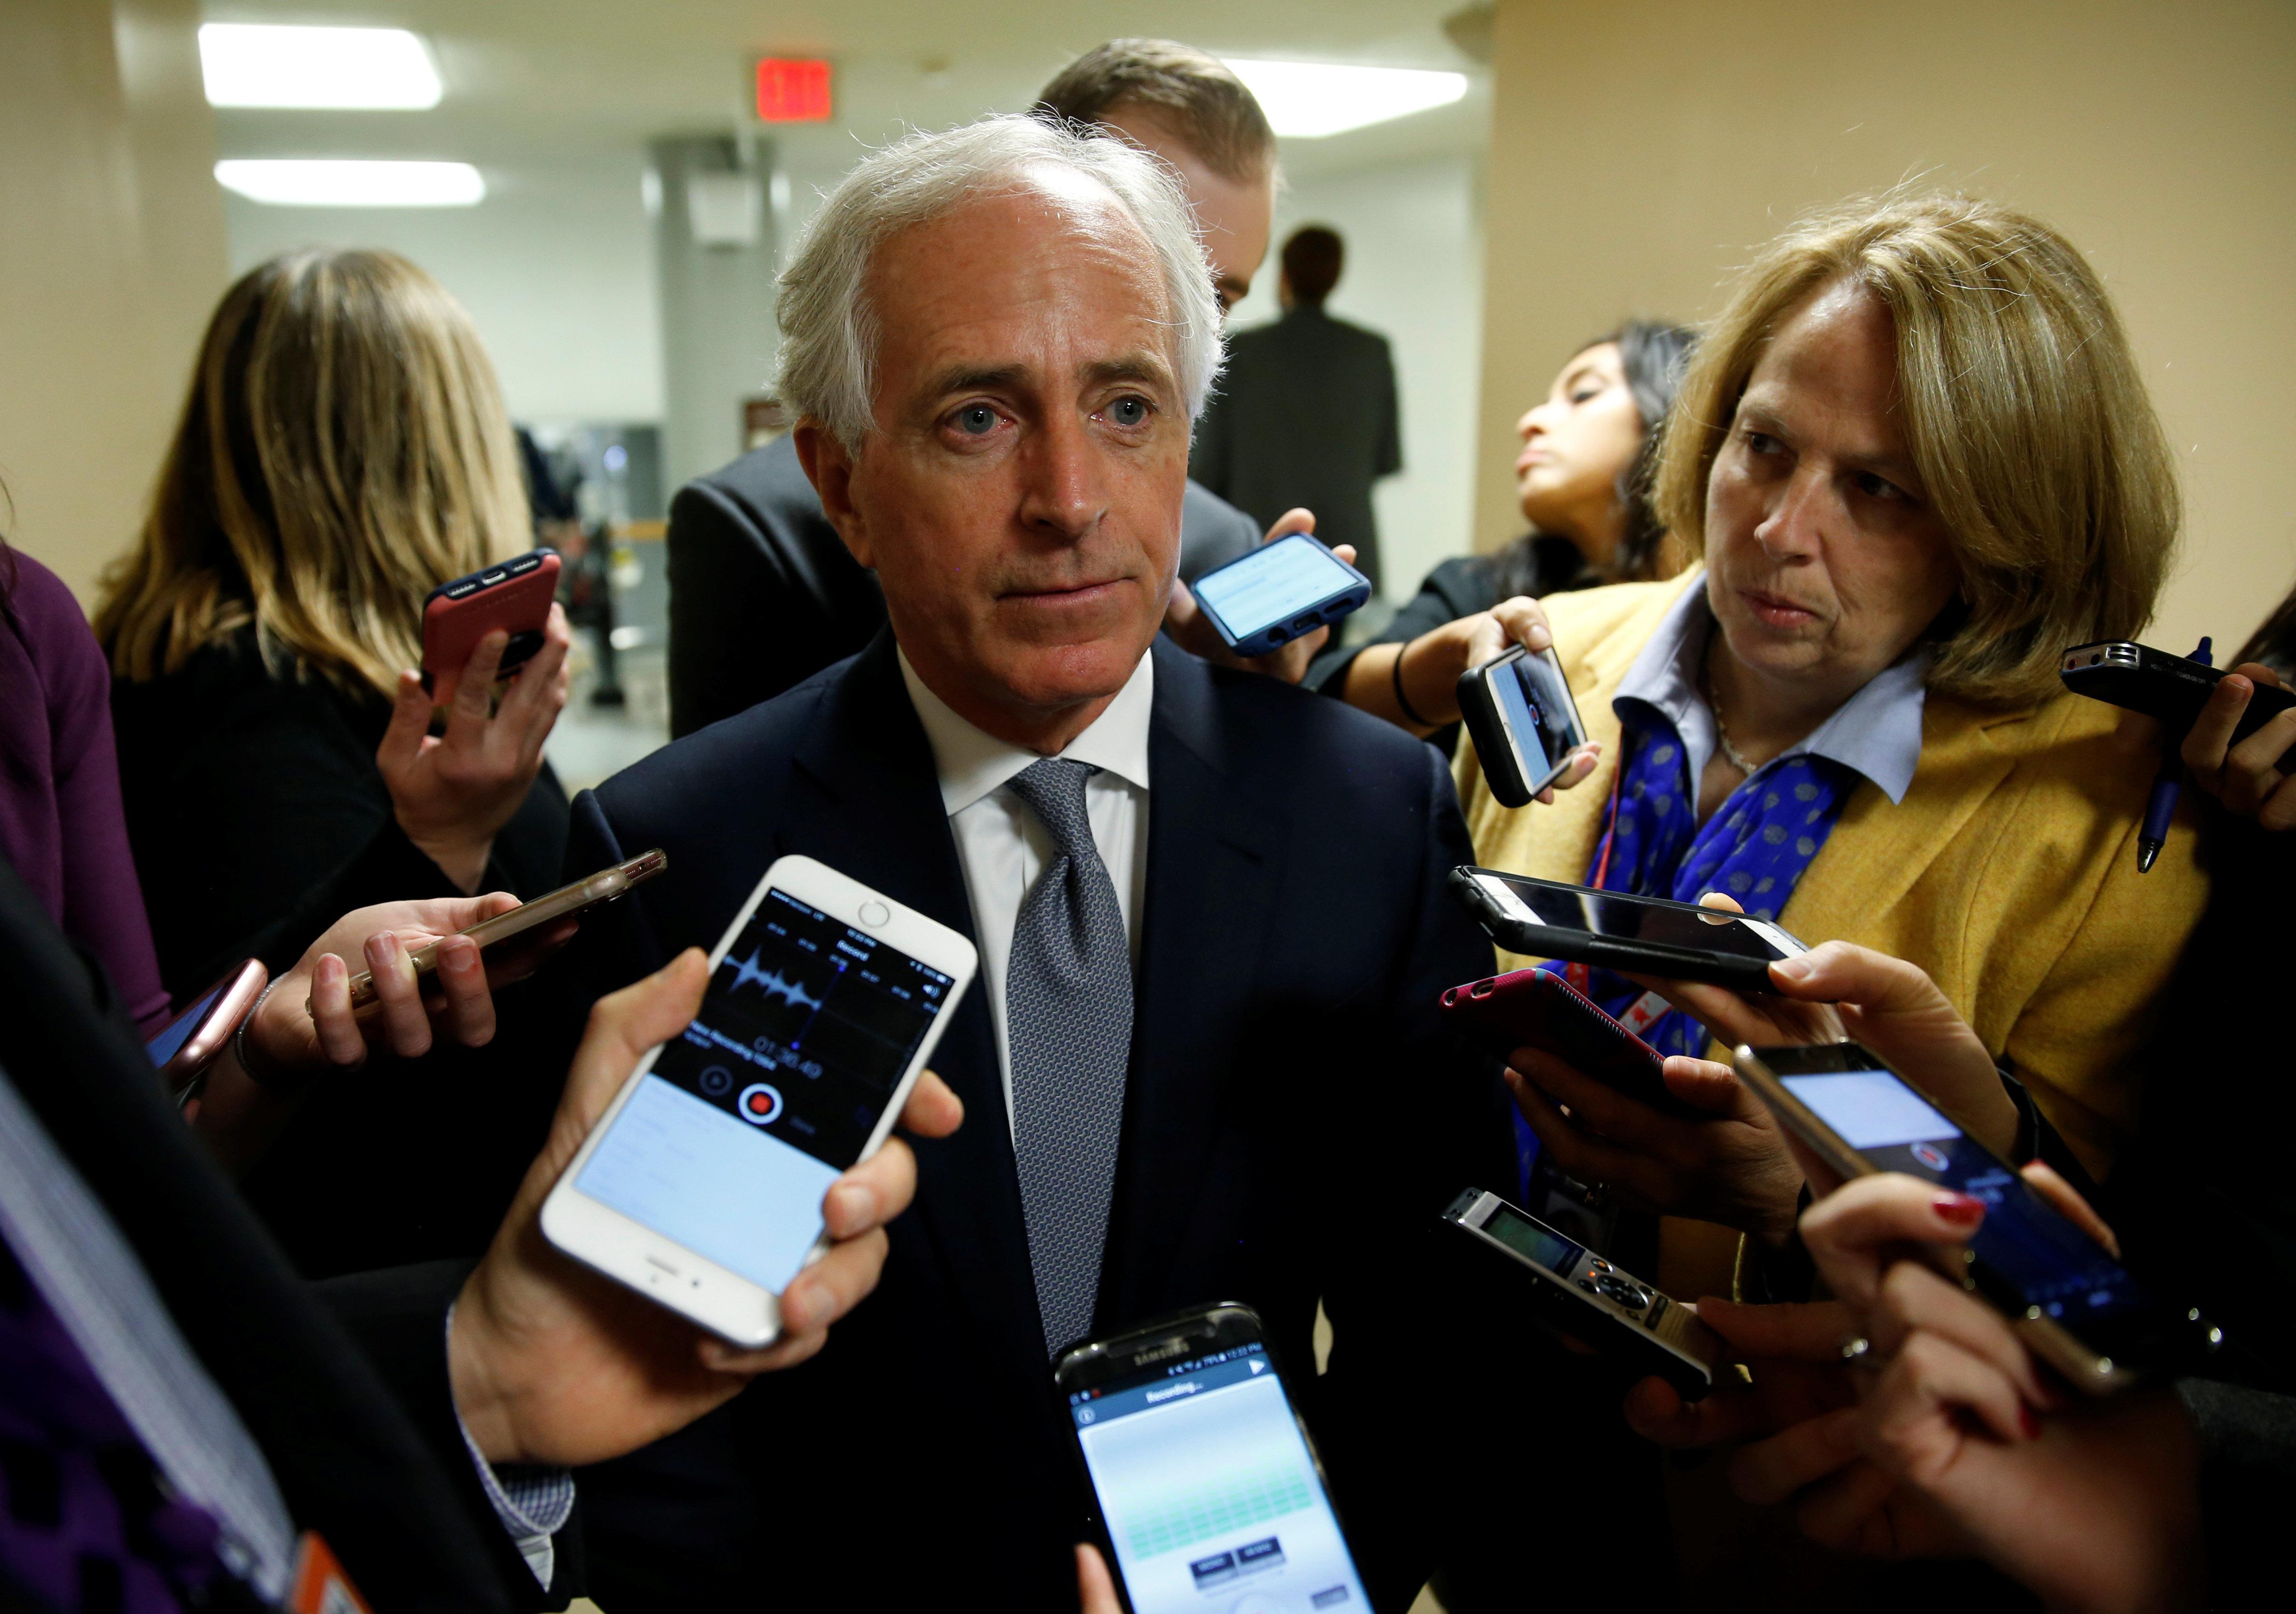 Iran, US to hold talks on 2015 nuke deal